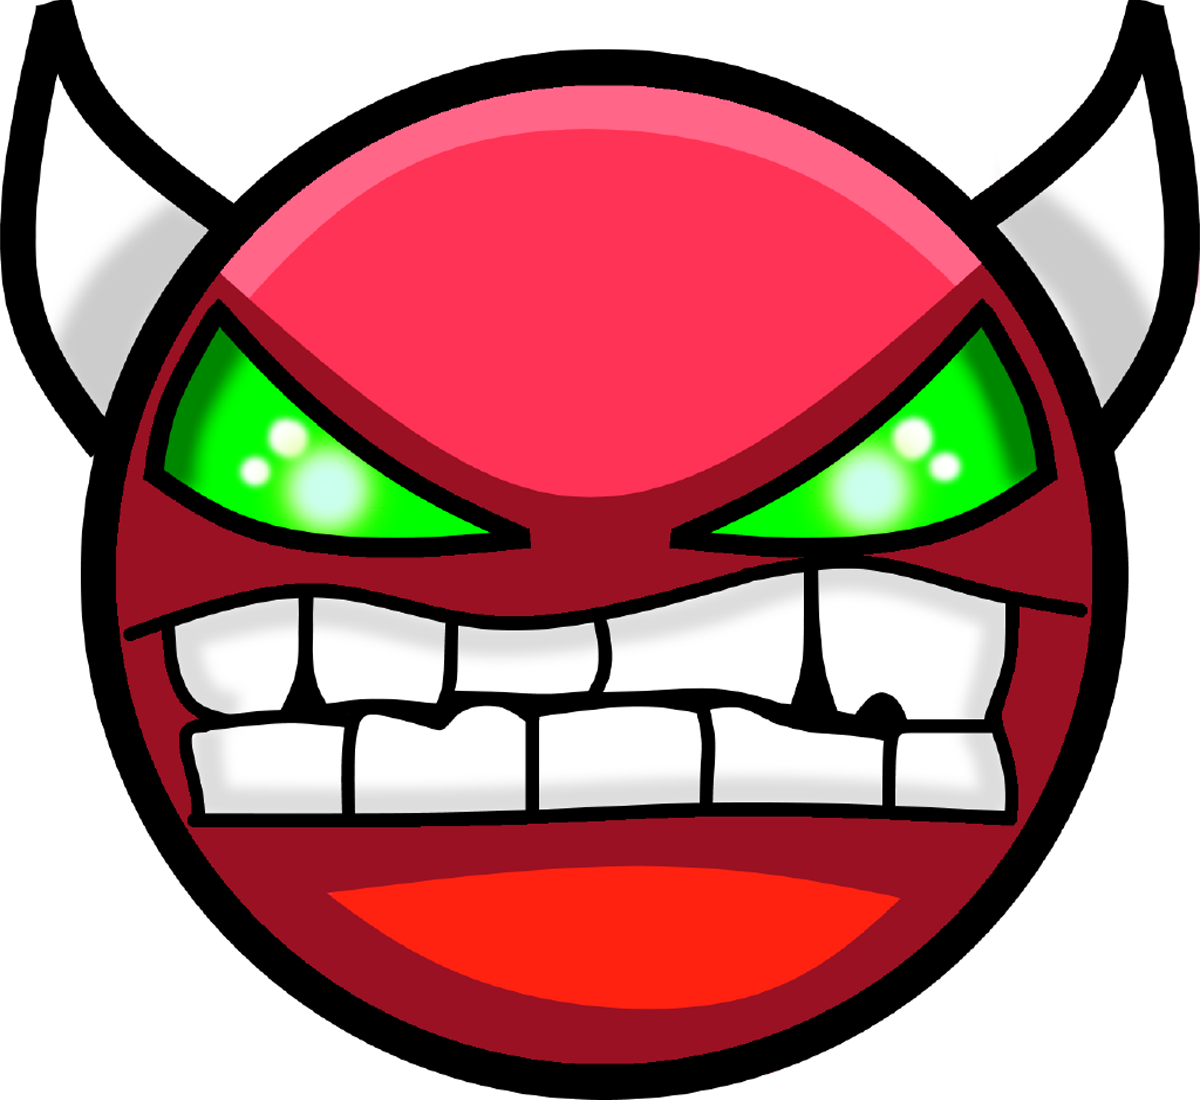 Demon PNG - 15211